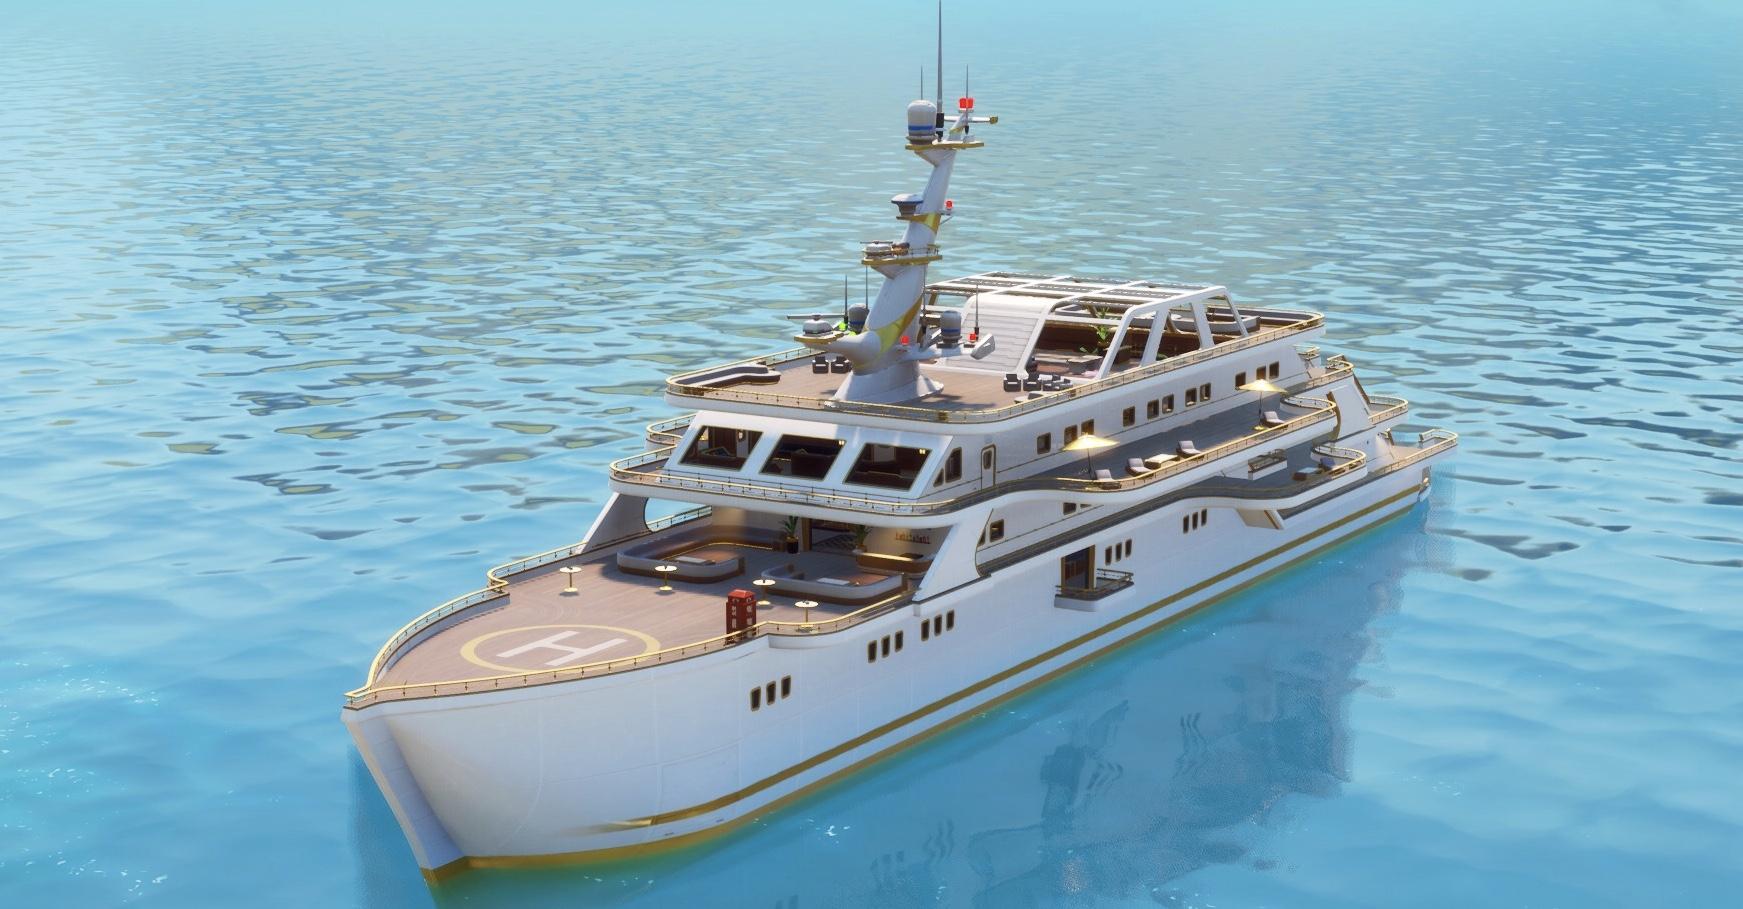 The Yacht | Fortnite Wiki | Fandom